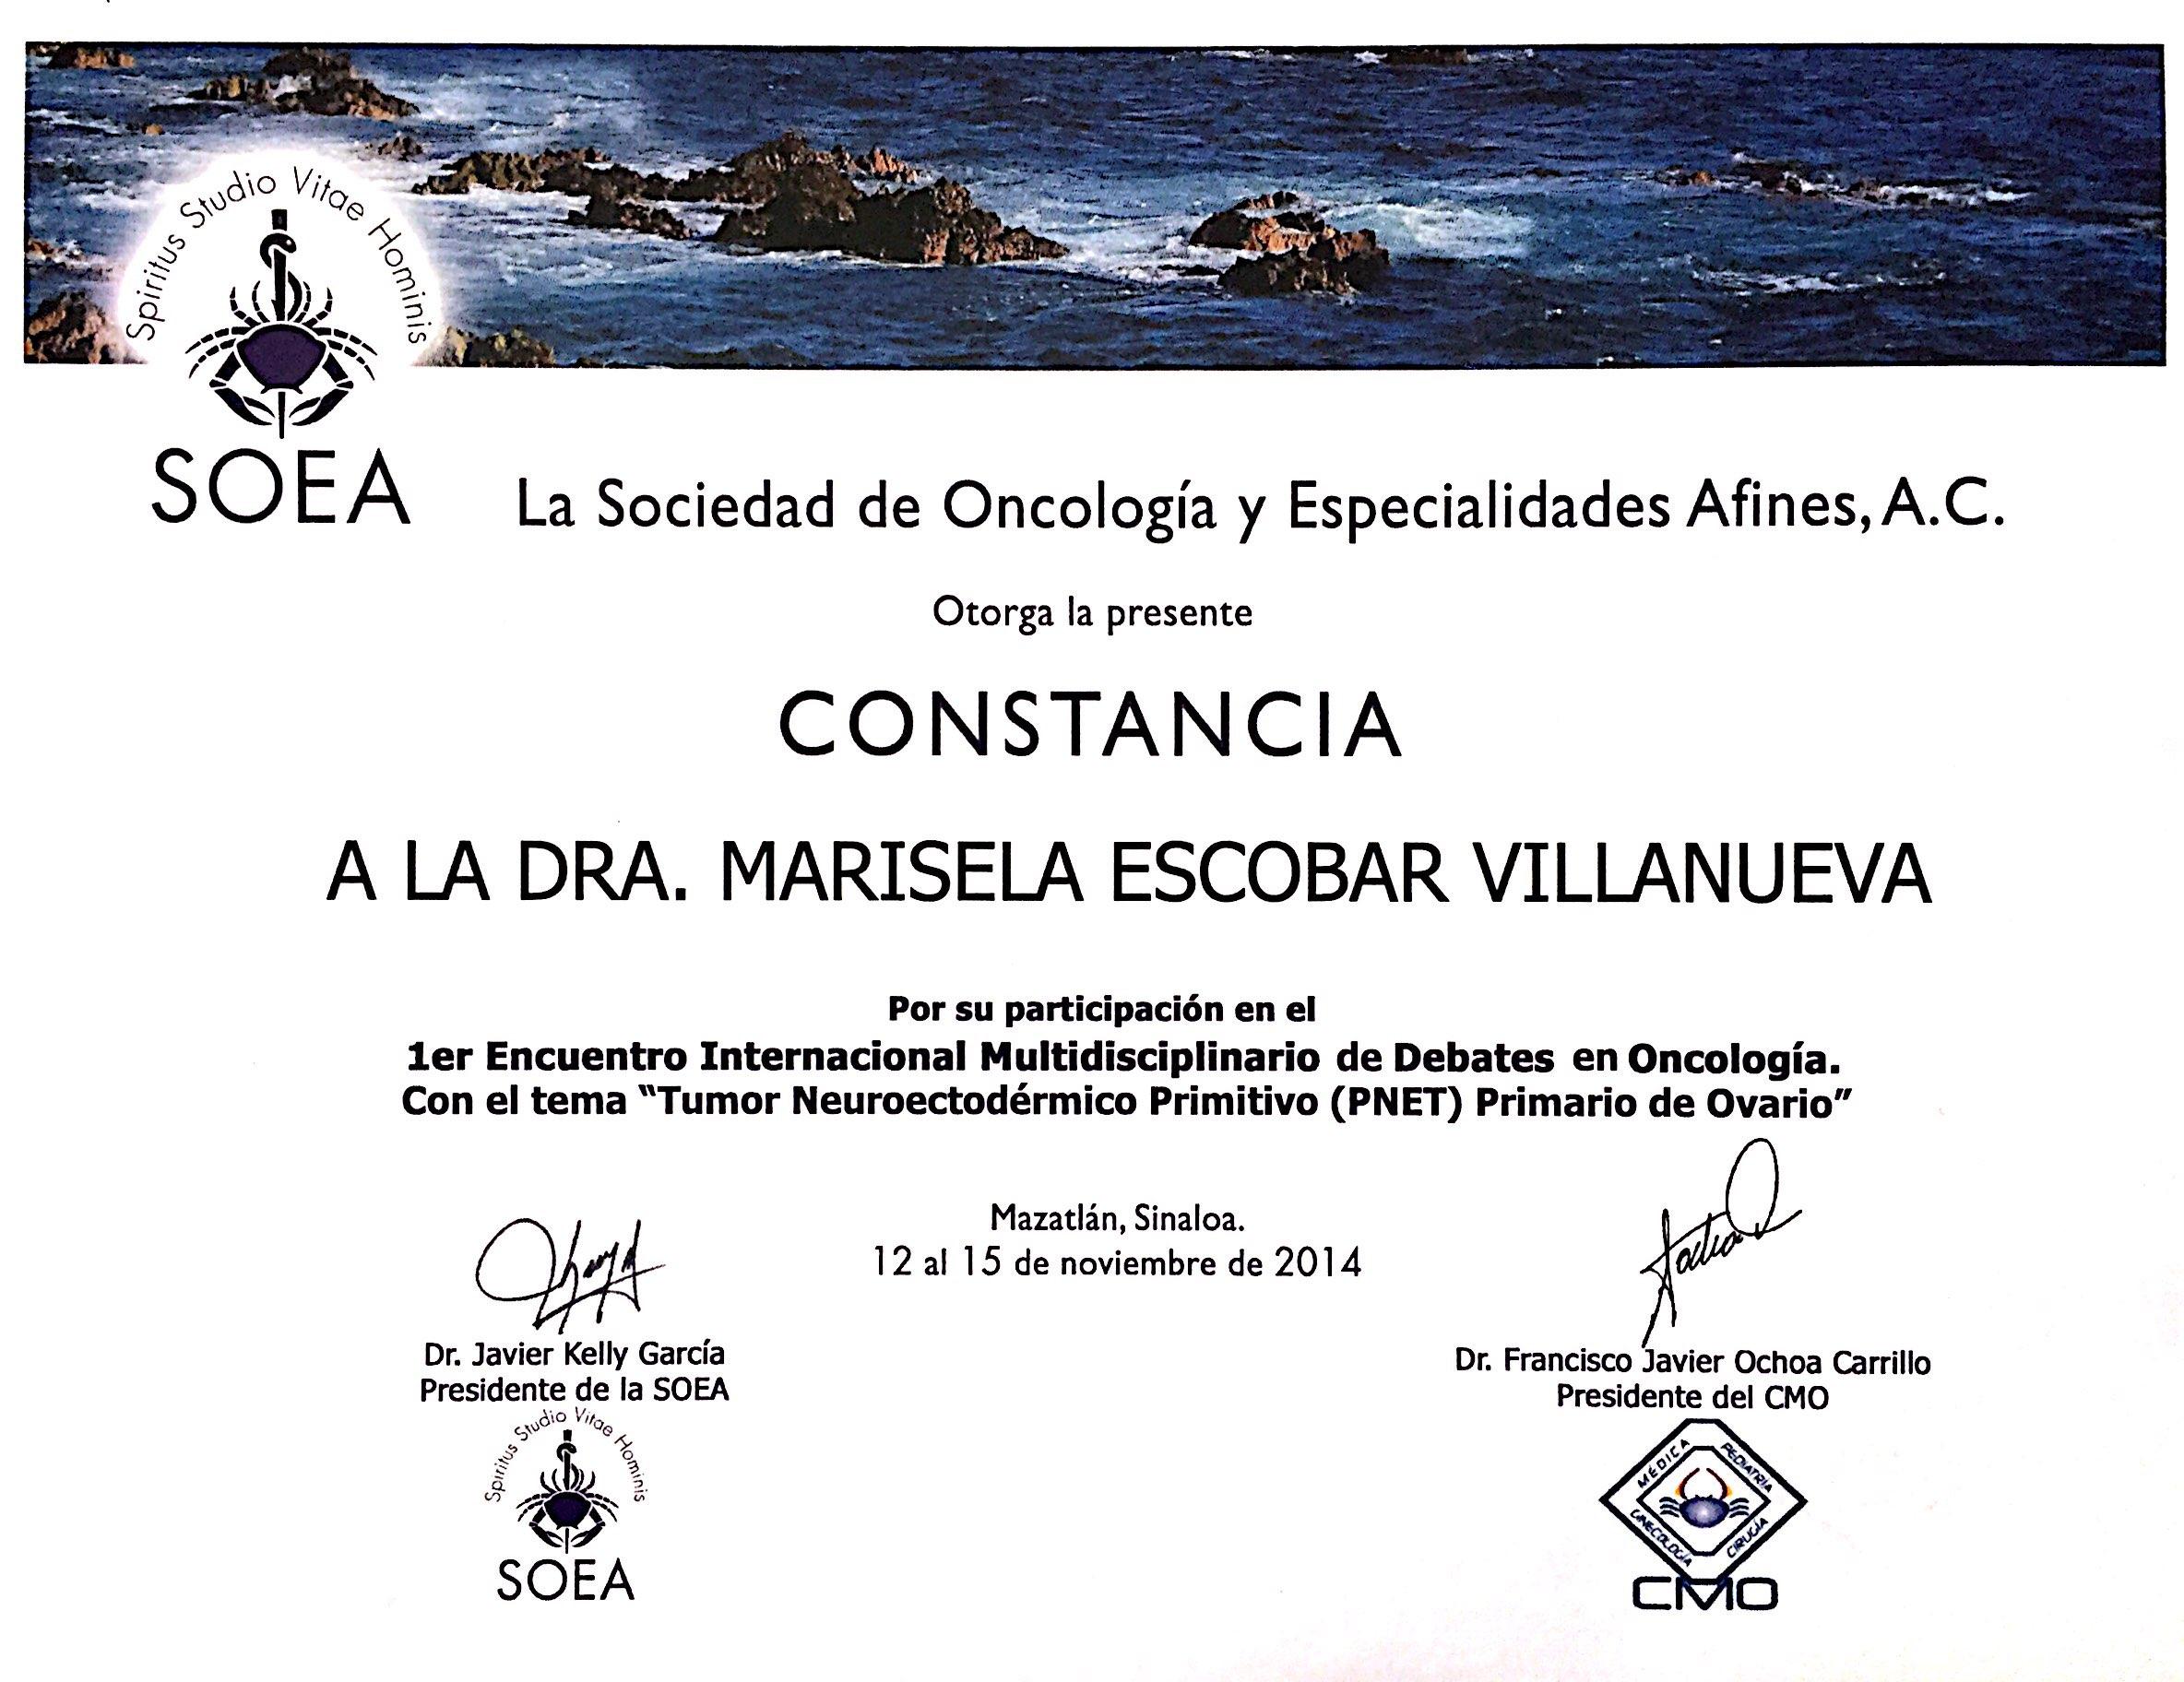 Nuevo doc 2018-02-20 11.21.39_37